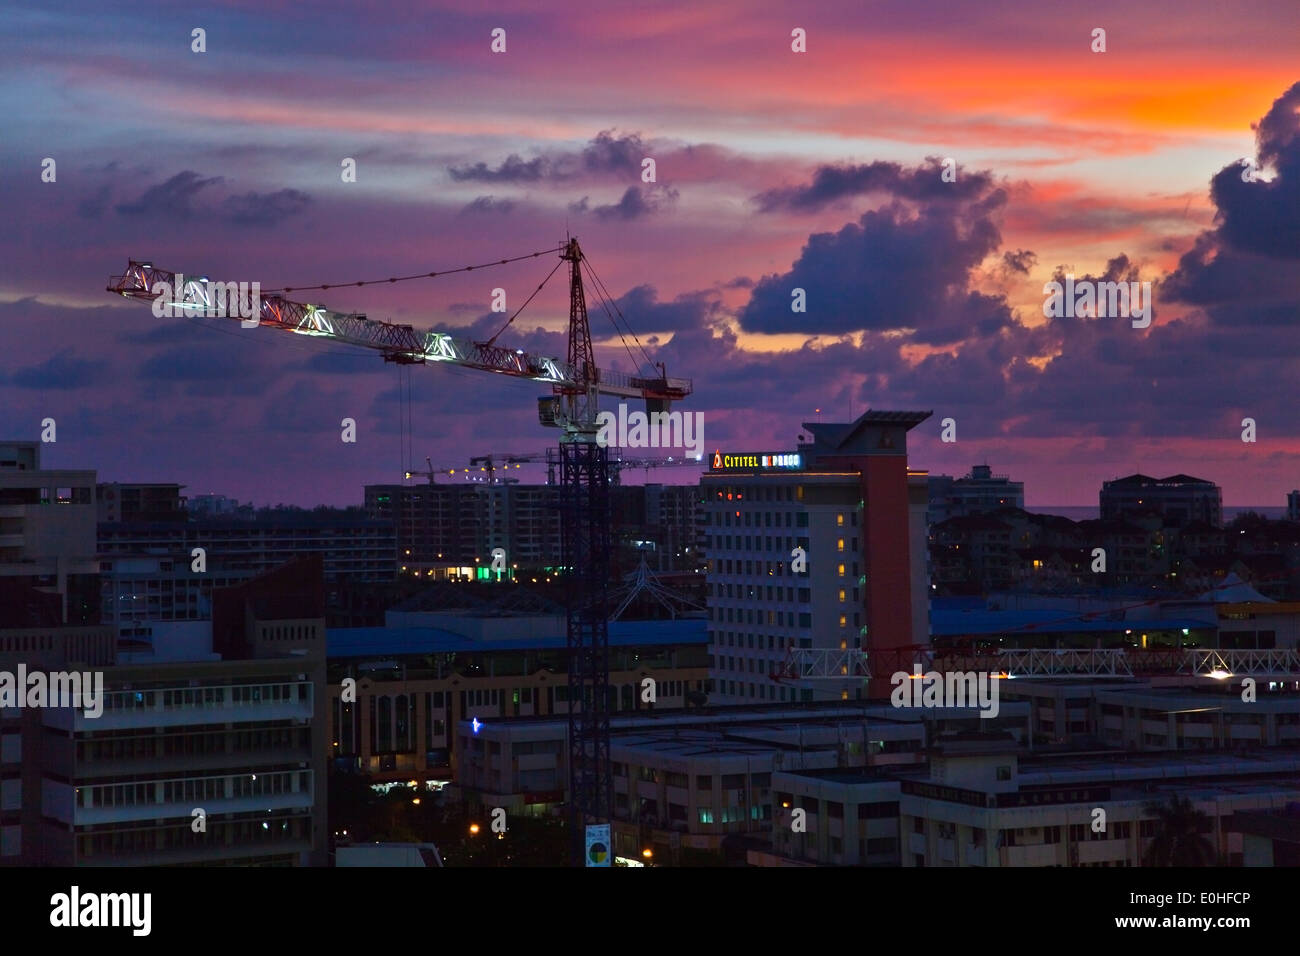 The skyline of the city of KOTA KINABALU at sunset - SABAH, BORNEO, MALAYSIA - Stock Image